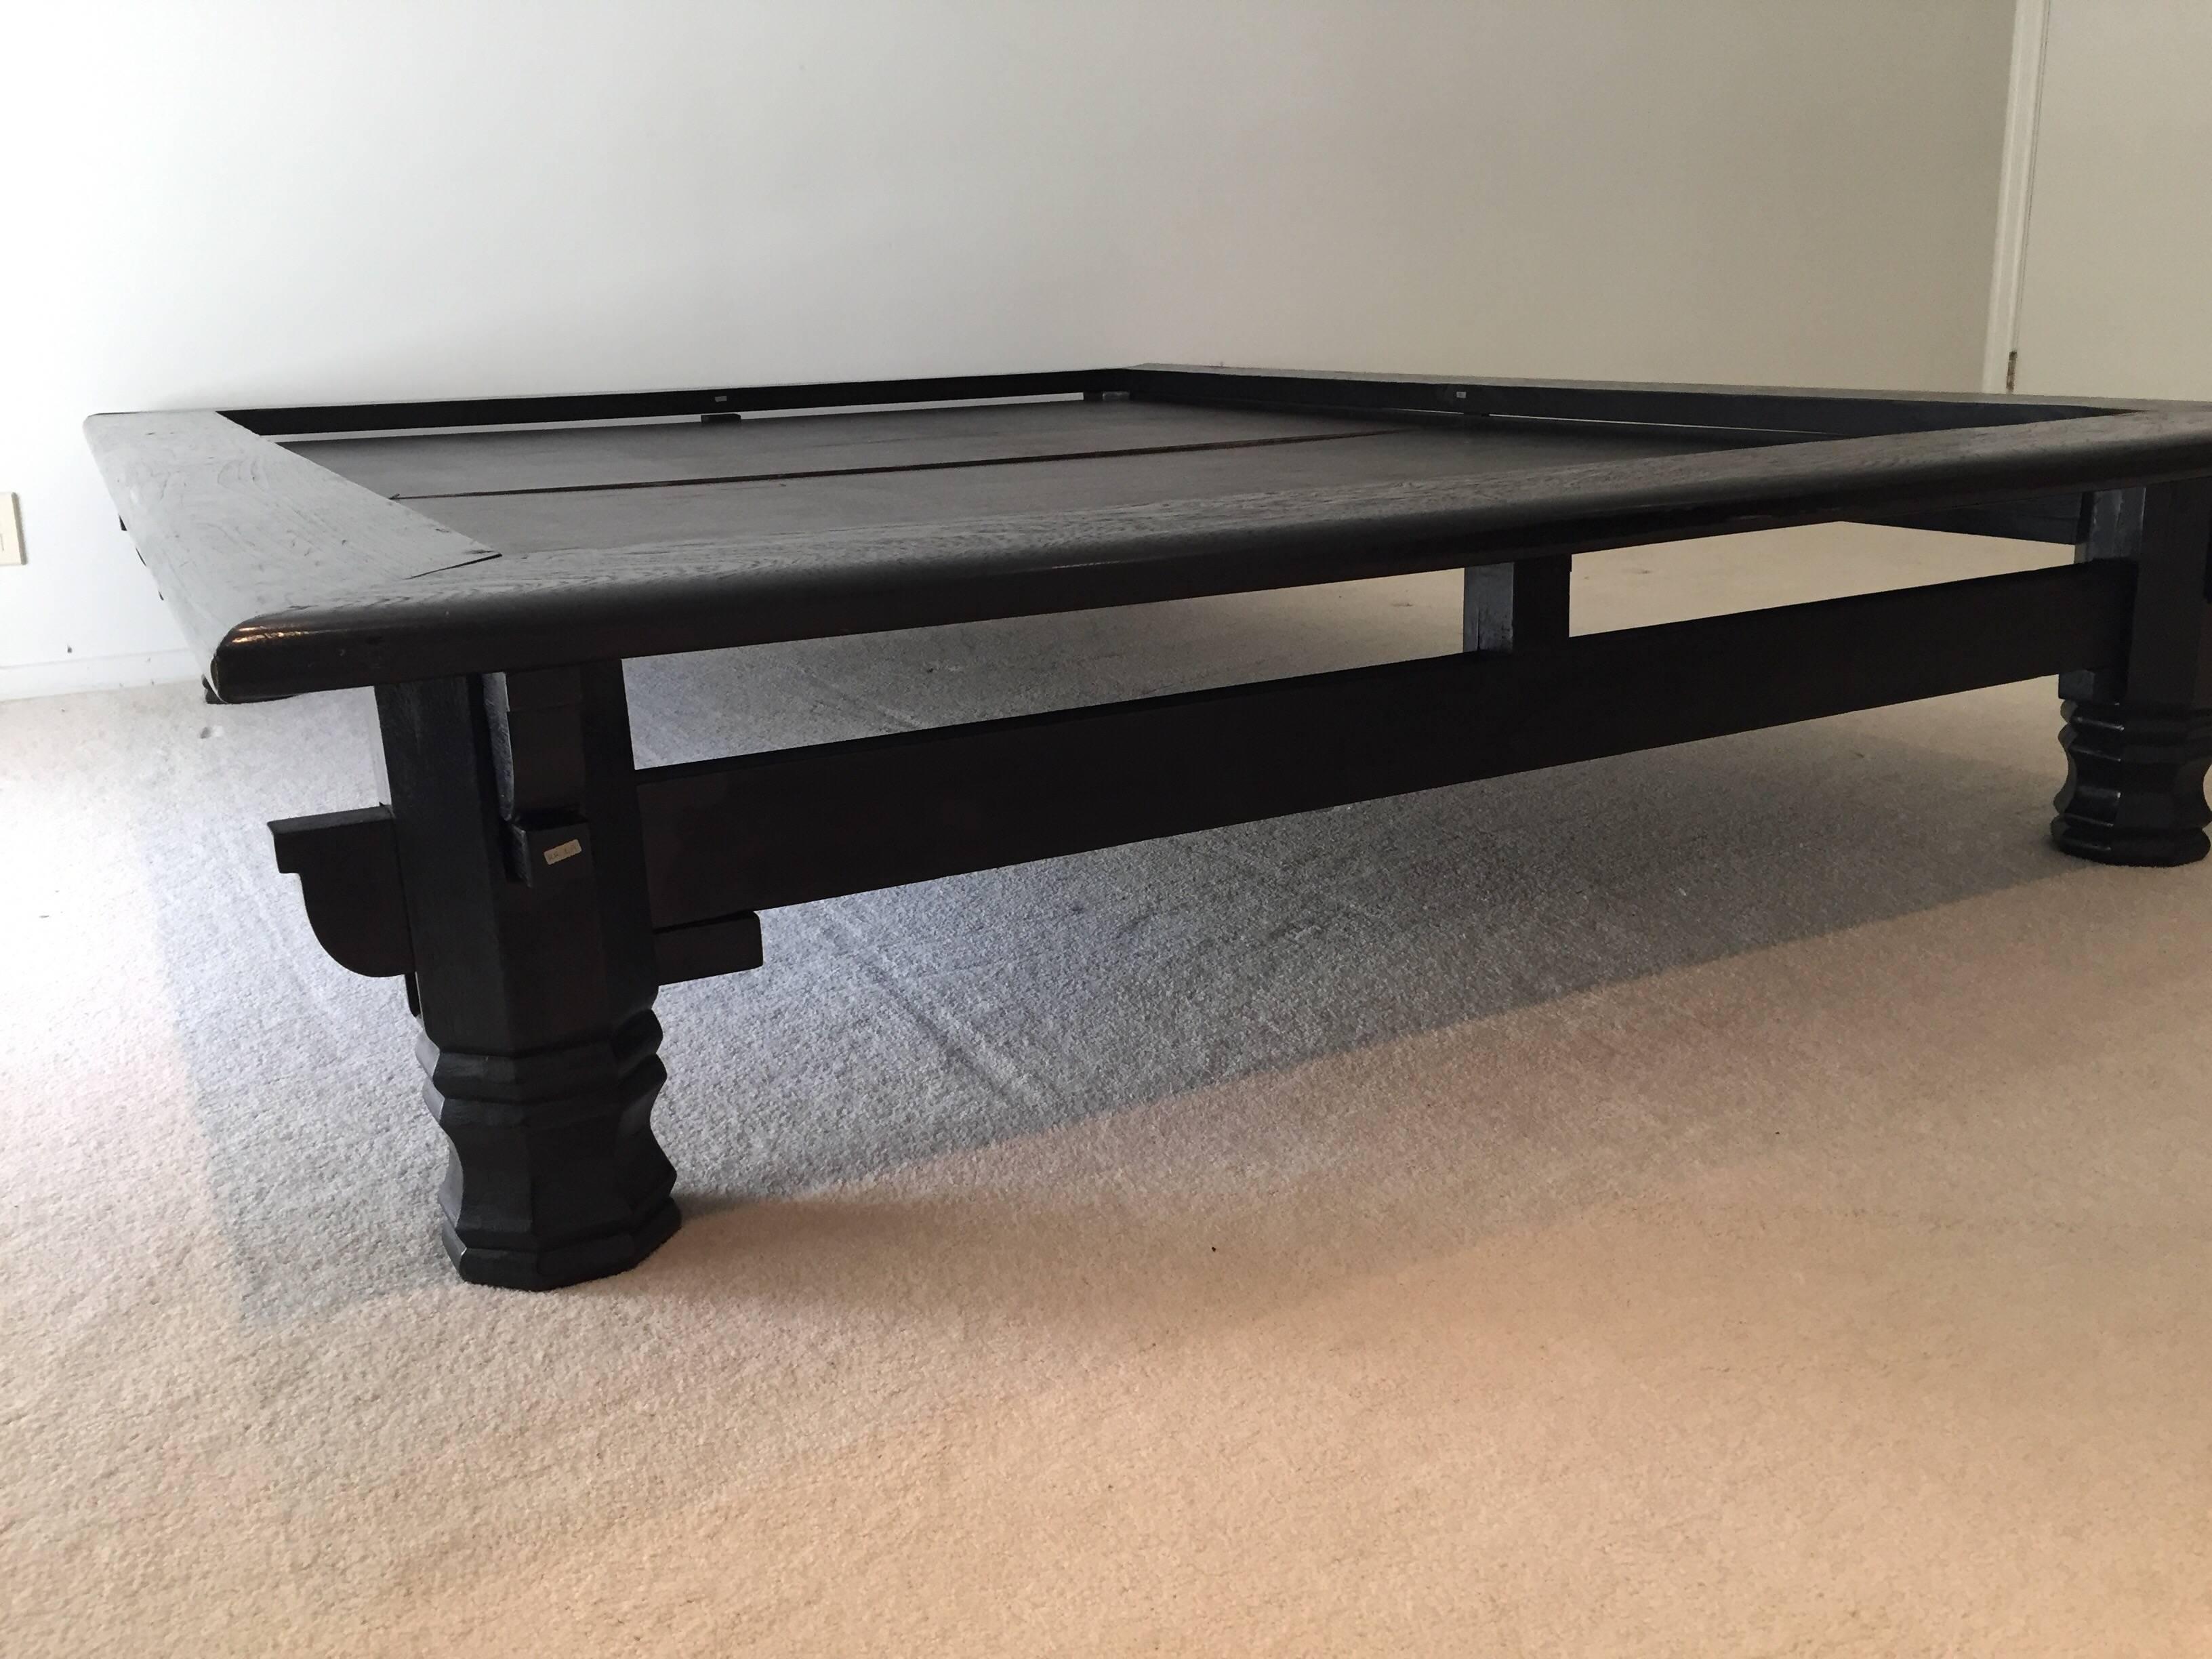 Etonnant Asian Japanese Low Platform Bed In Black Solid Wood. Minimalist Organic  Modern Platform Bed,